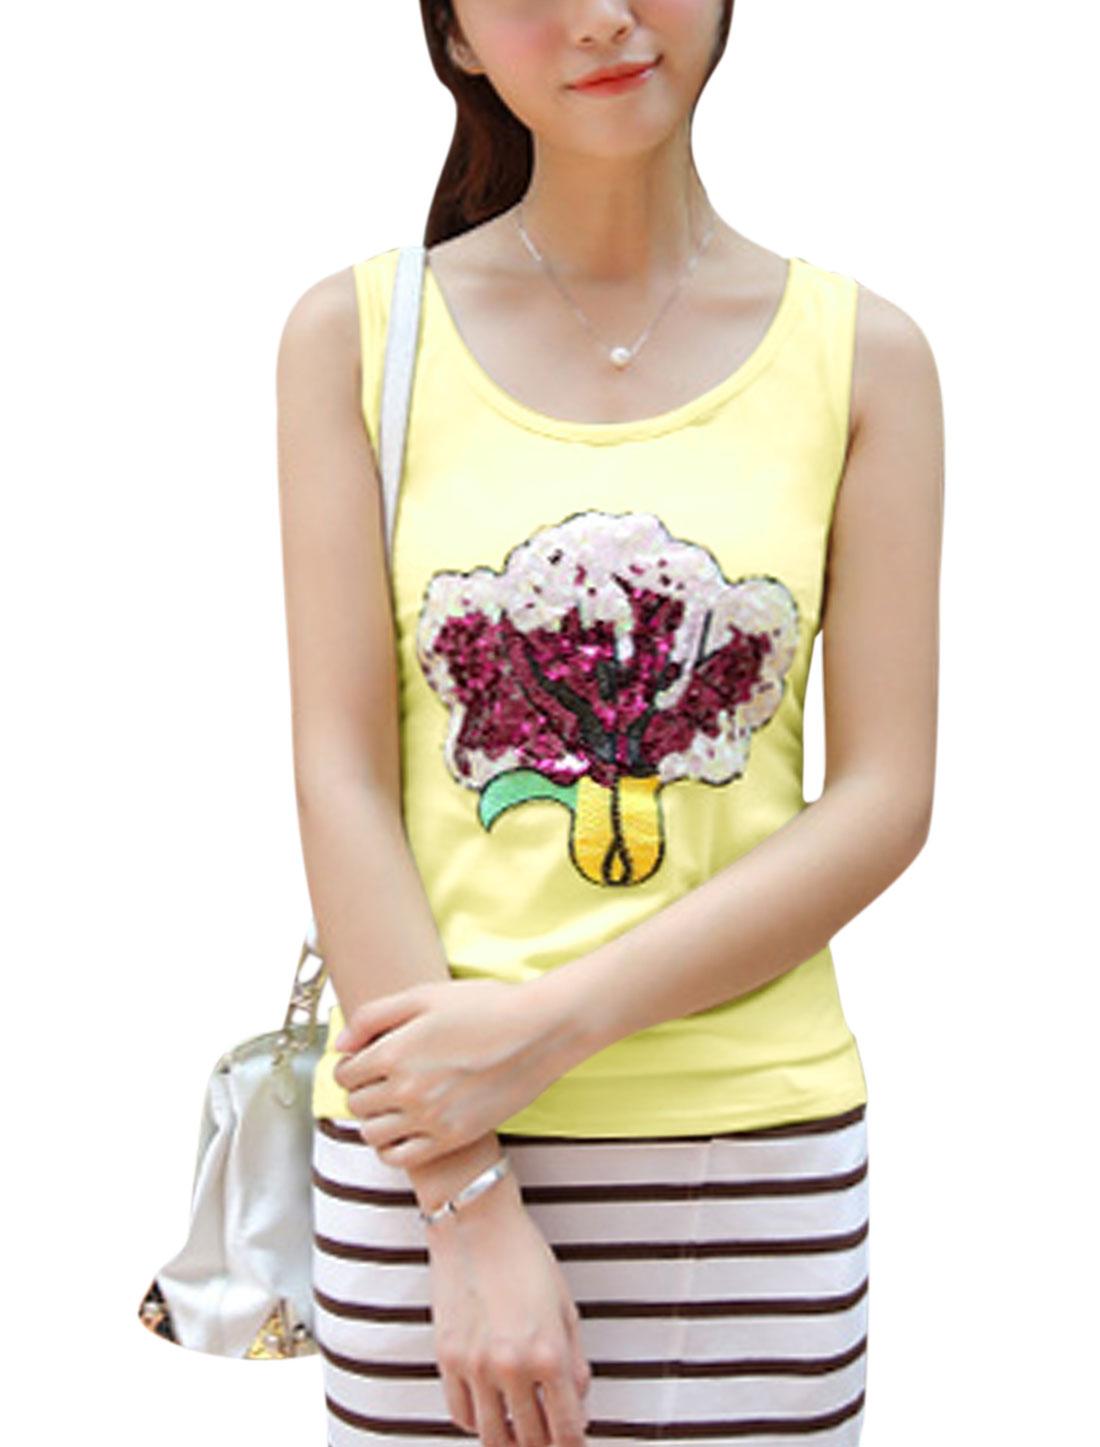 Ladies Sleeveless Plant Applique Fashion Tank Top Light Yellow S